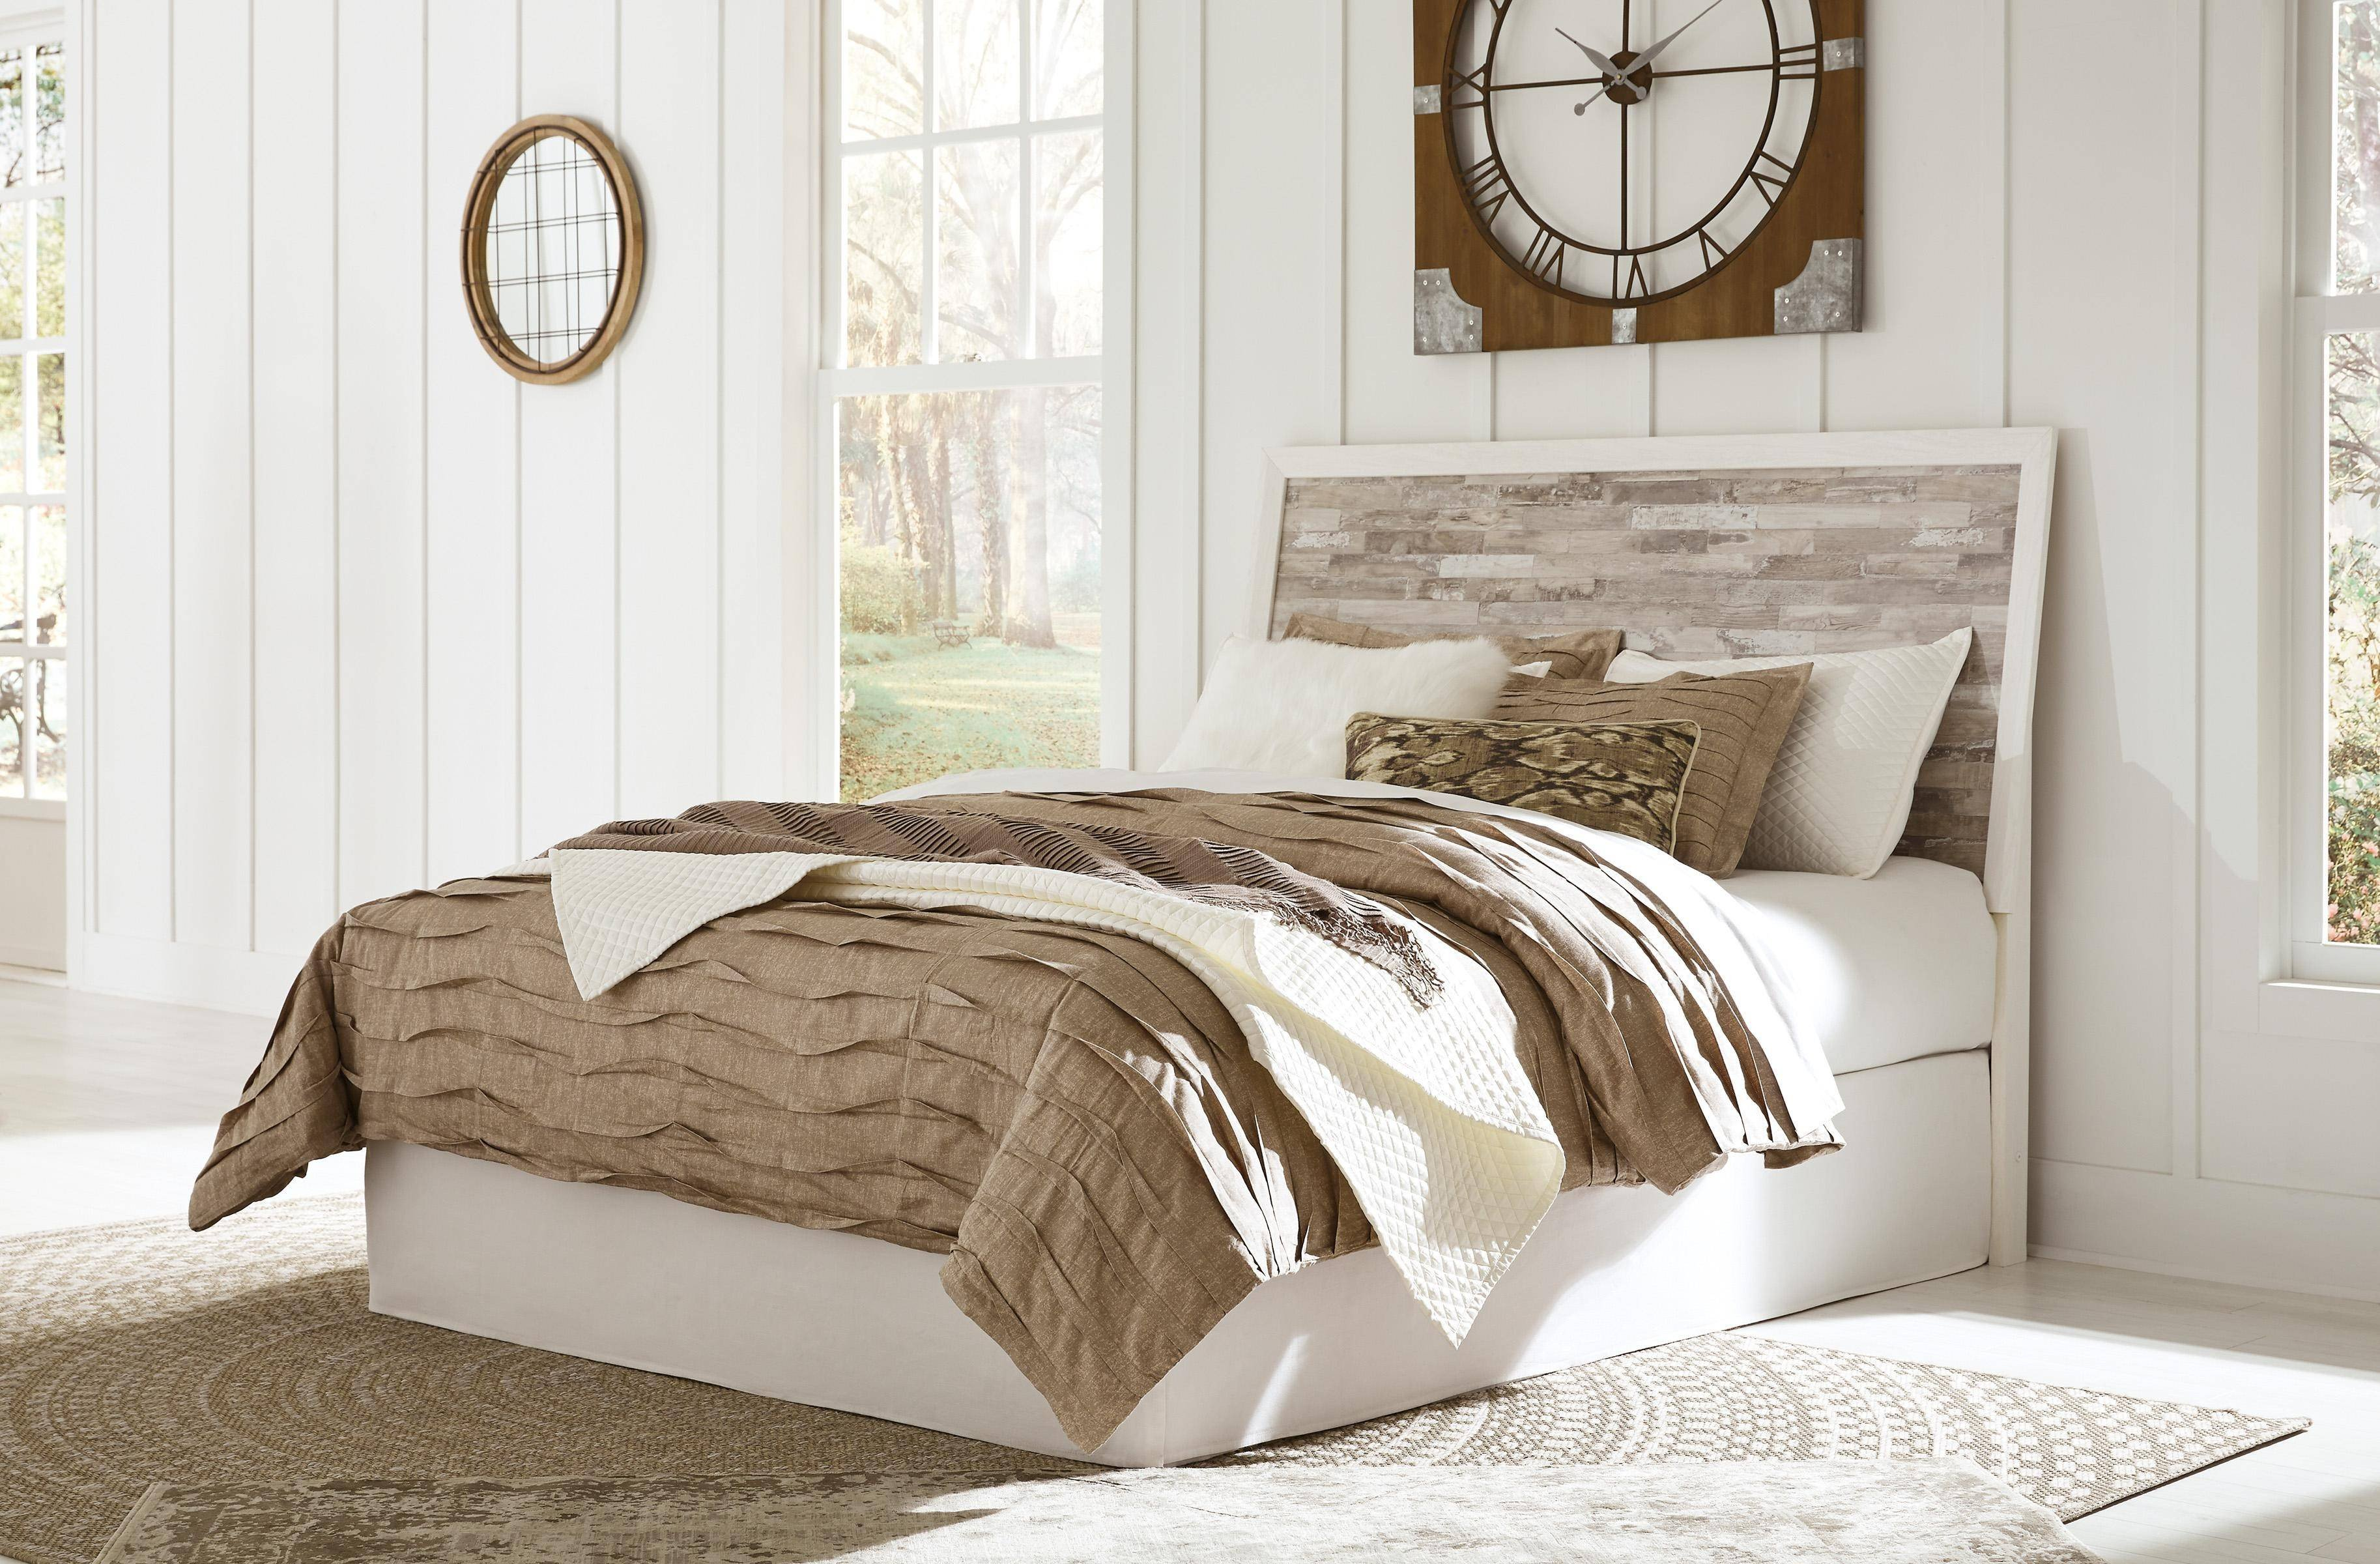 Ashley Home Store Bedroom Set Luxury ashley Evanni B315 Queen Size Platform Bedroom Set 6pcs In